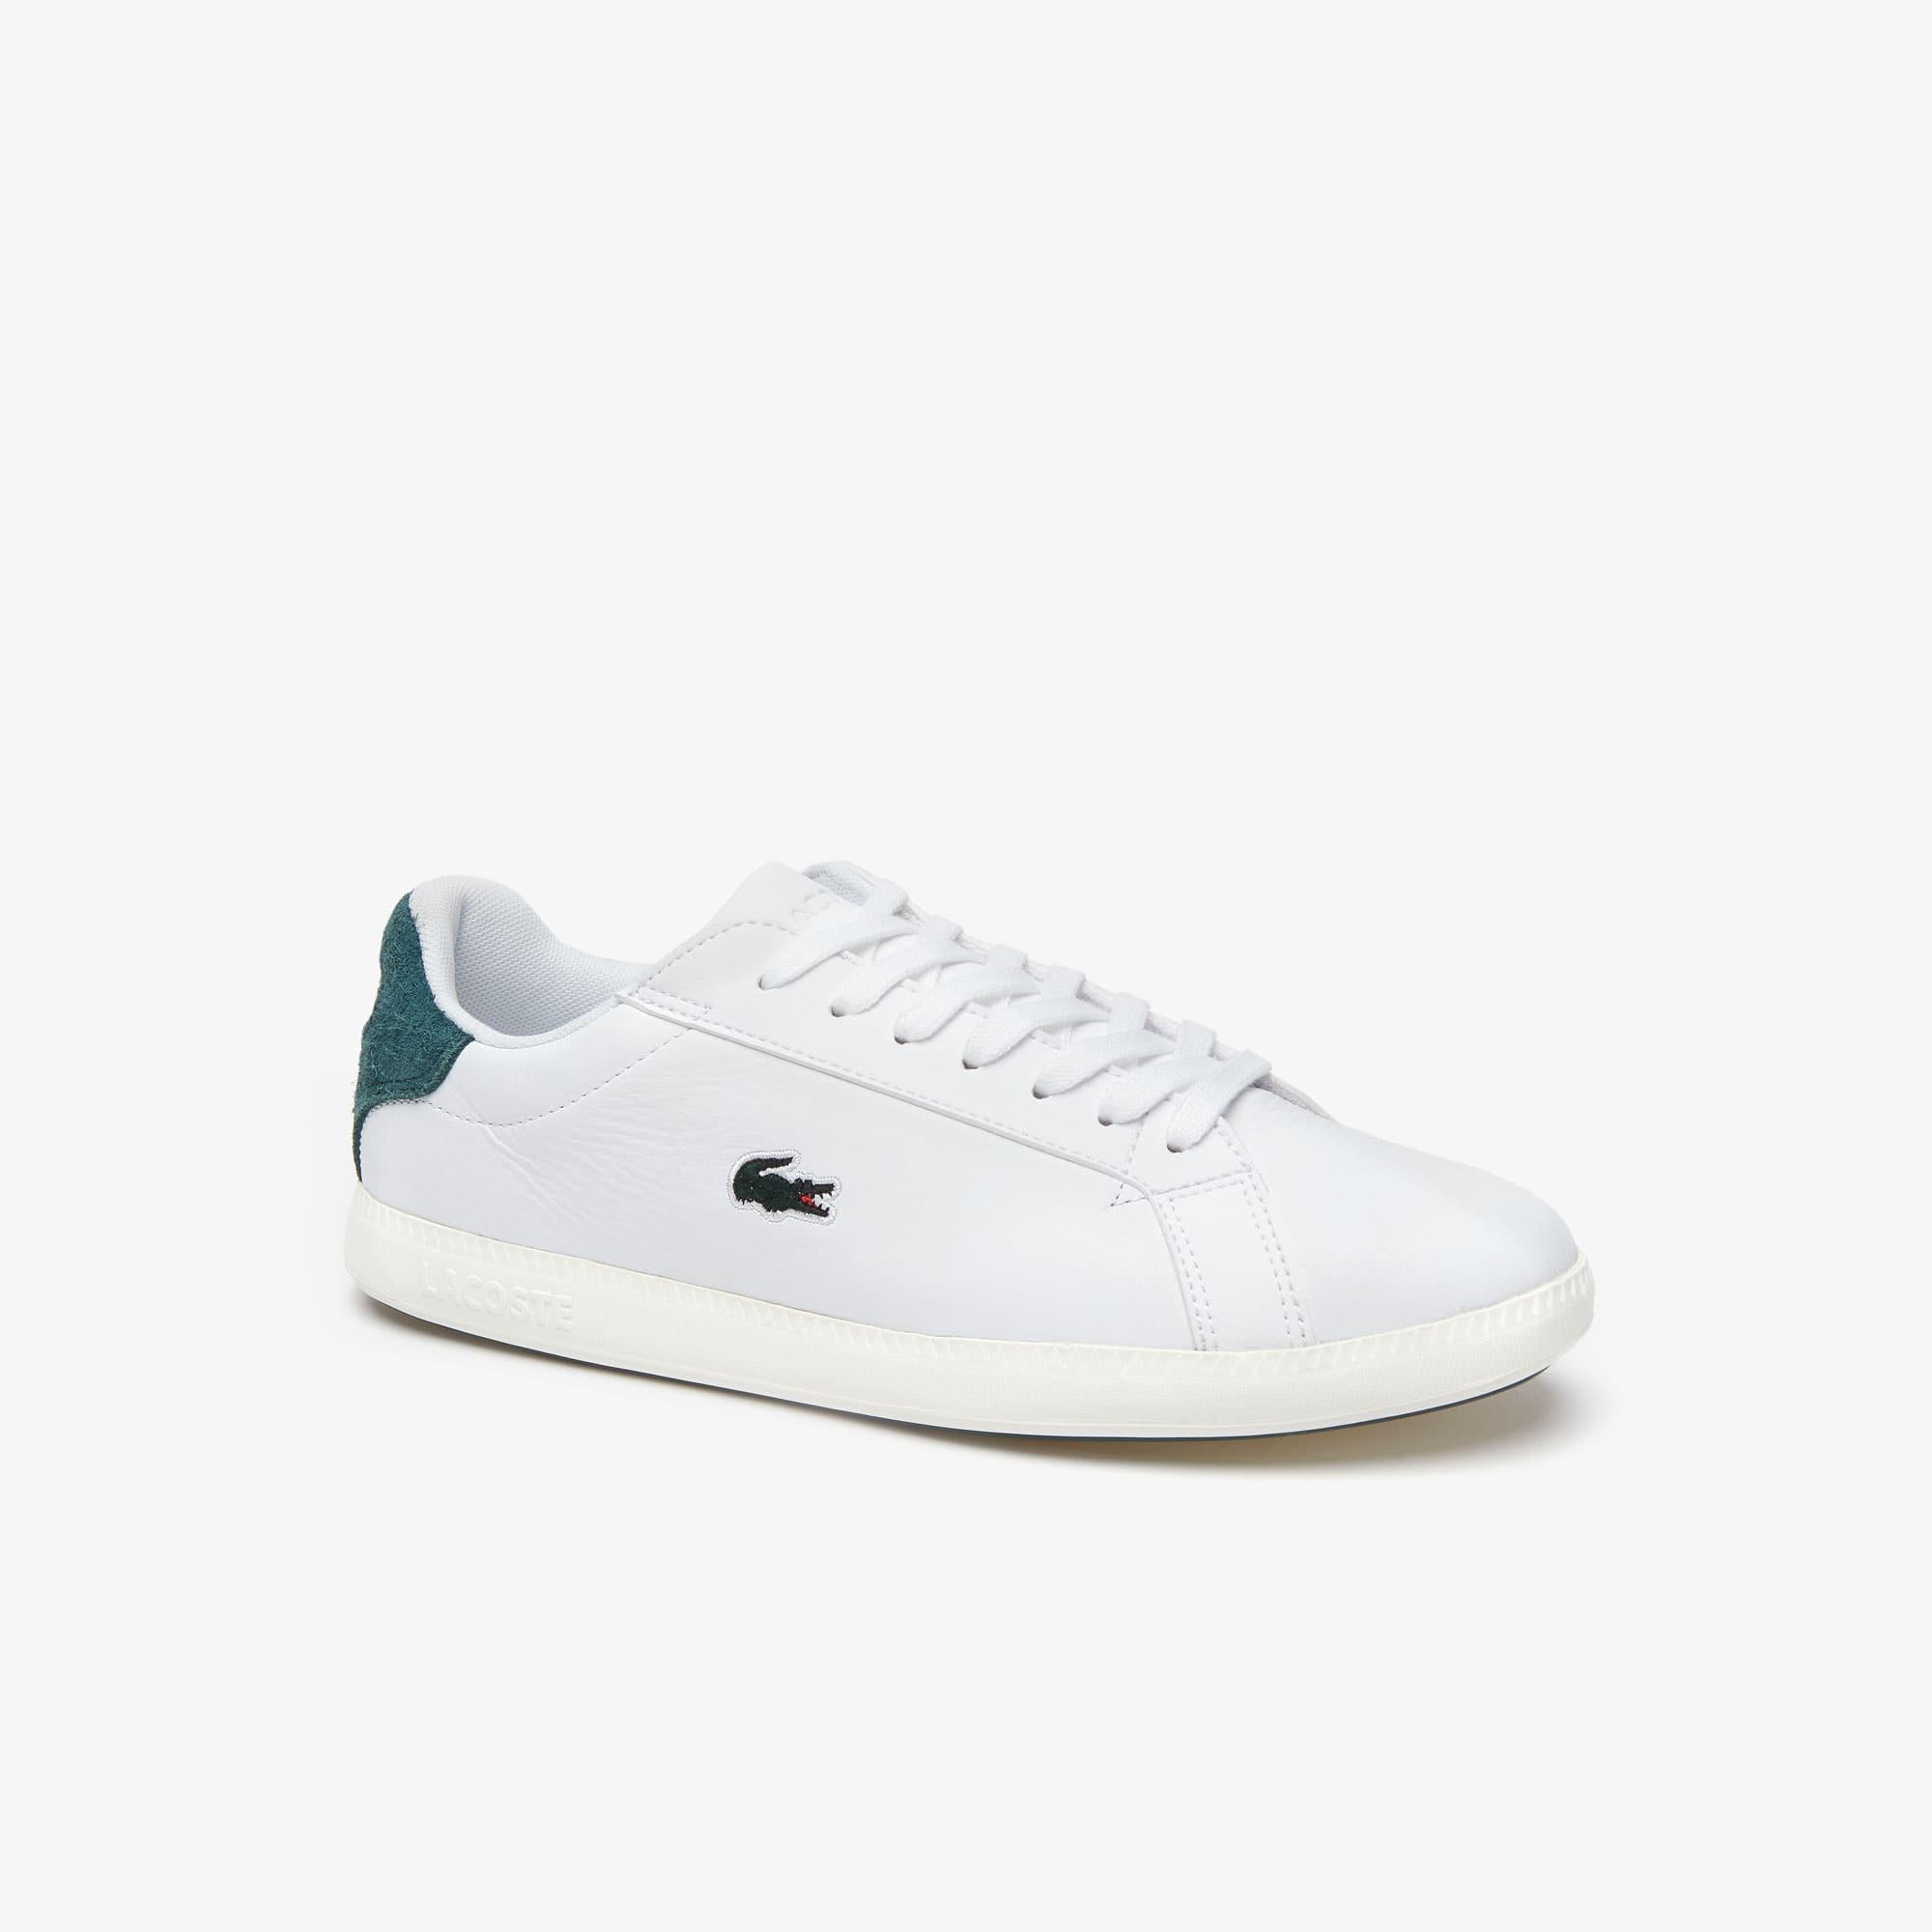 chaussure basket lacoste femme,personnaliser chaussures